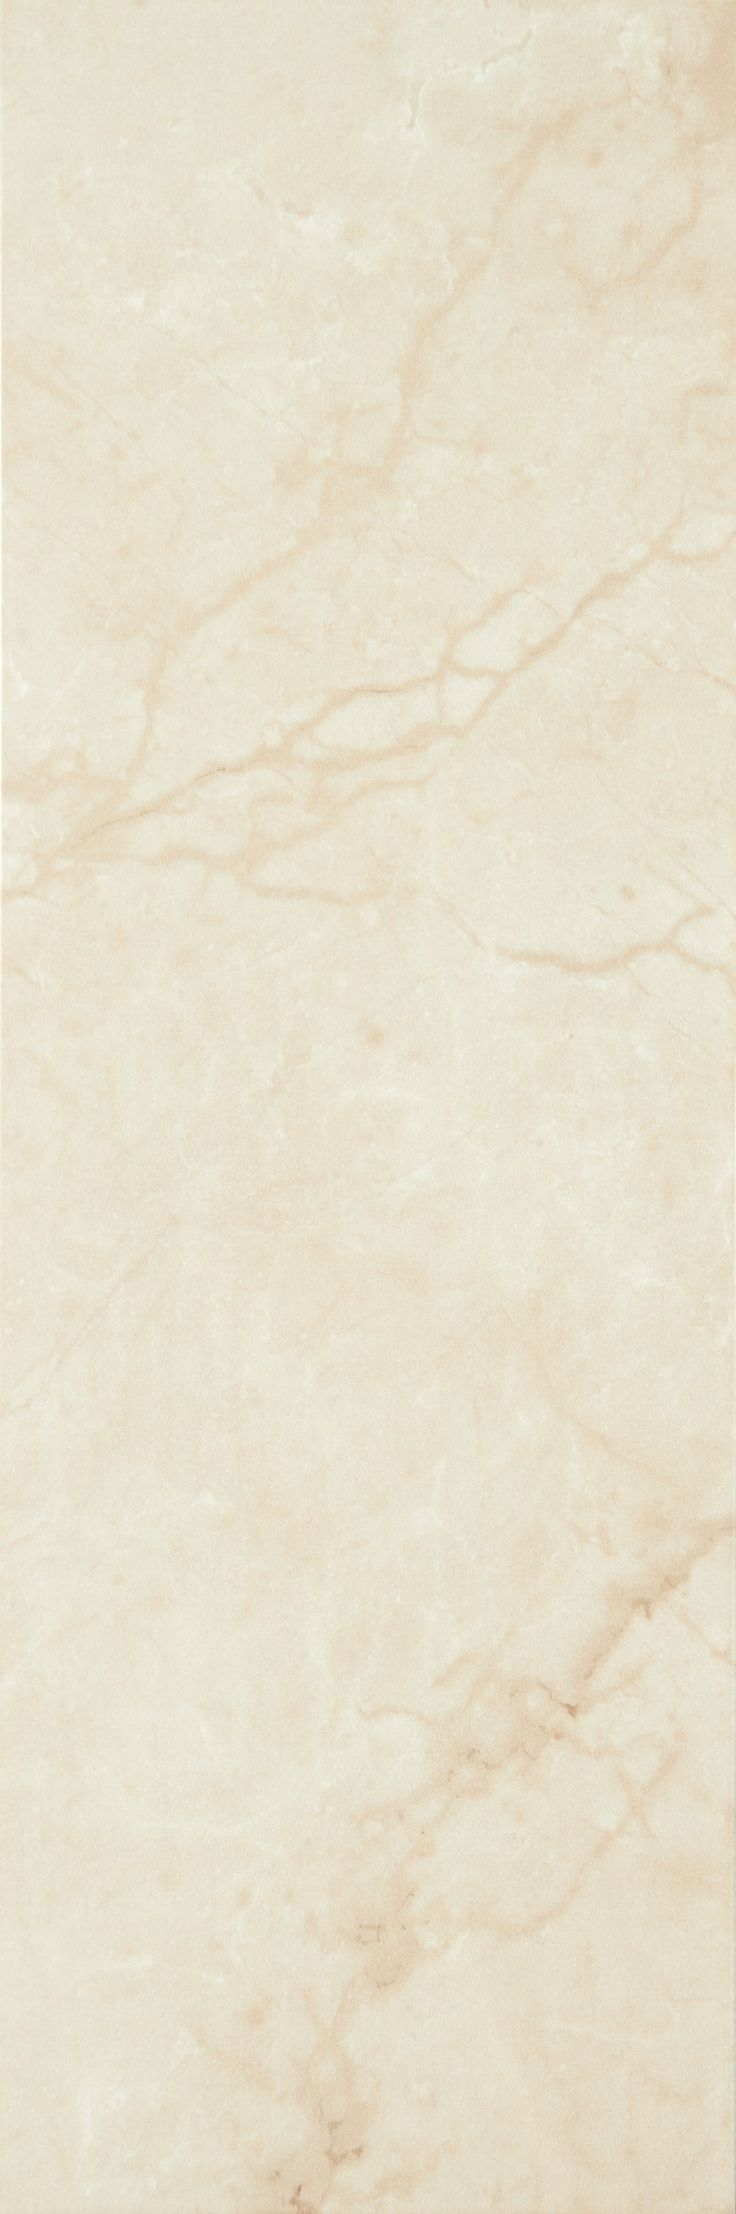 #Aparici #Luxury Lineage Ivory 20x59,2 Cm | #Feinsteinzeug #Marmor #